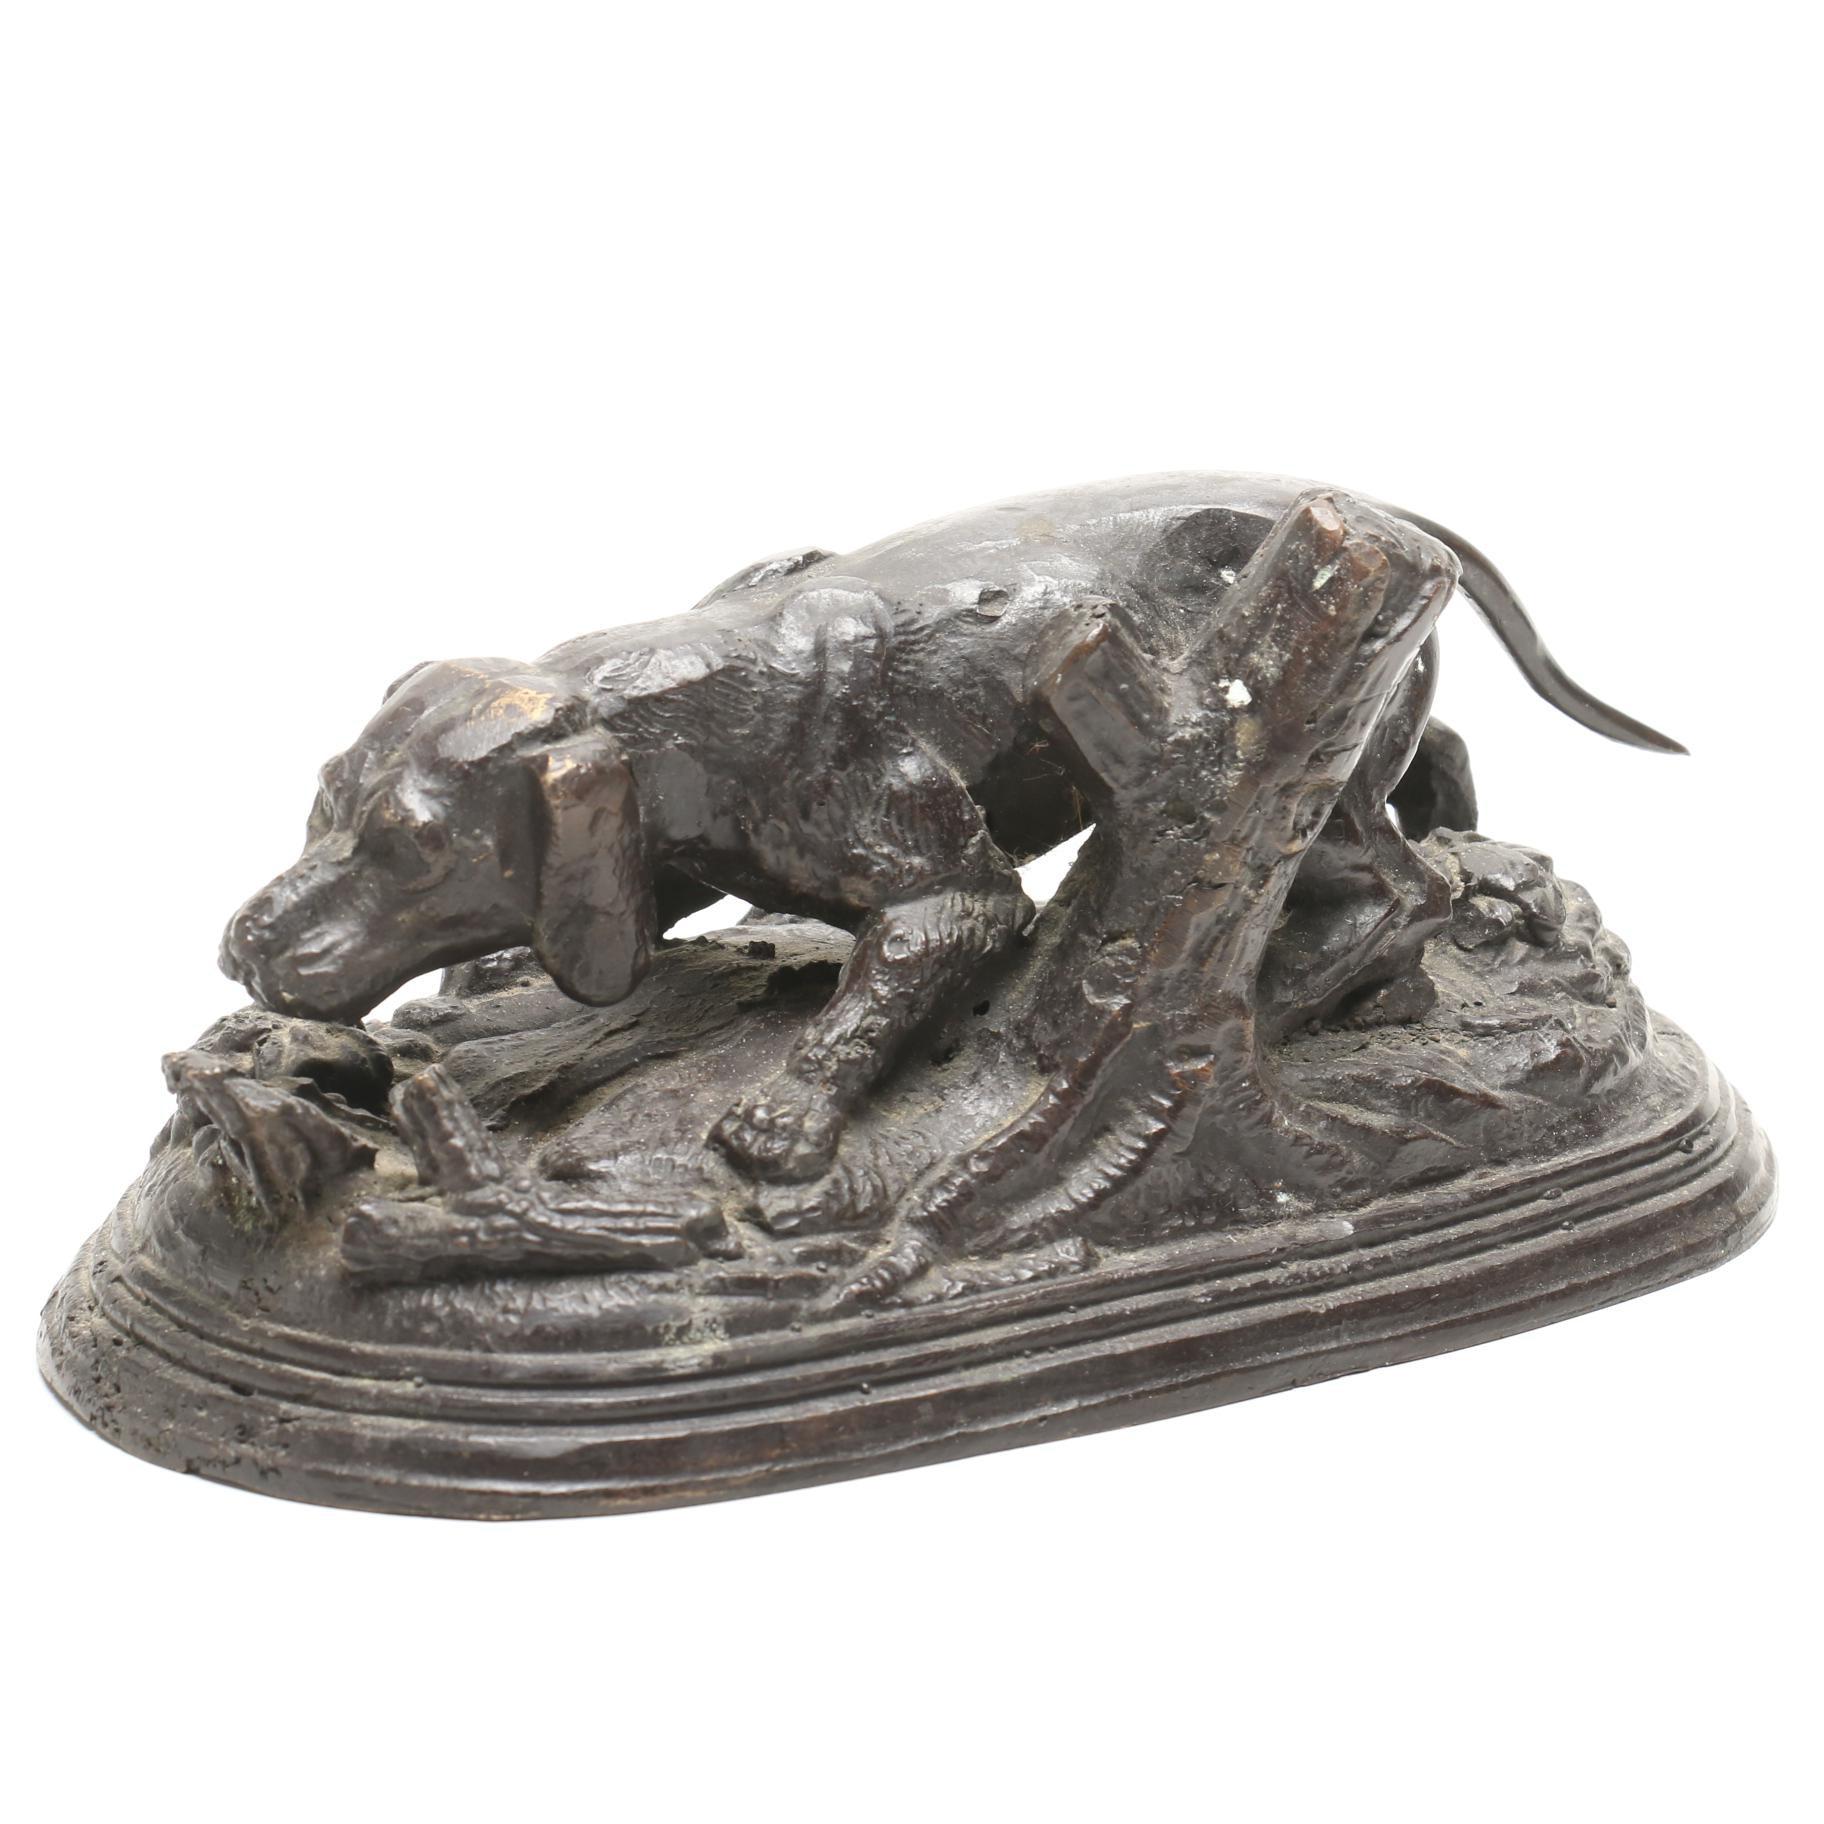 Cast Metal Hunting Dog Sculpture